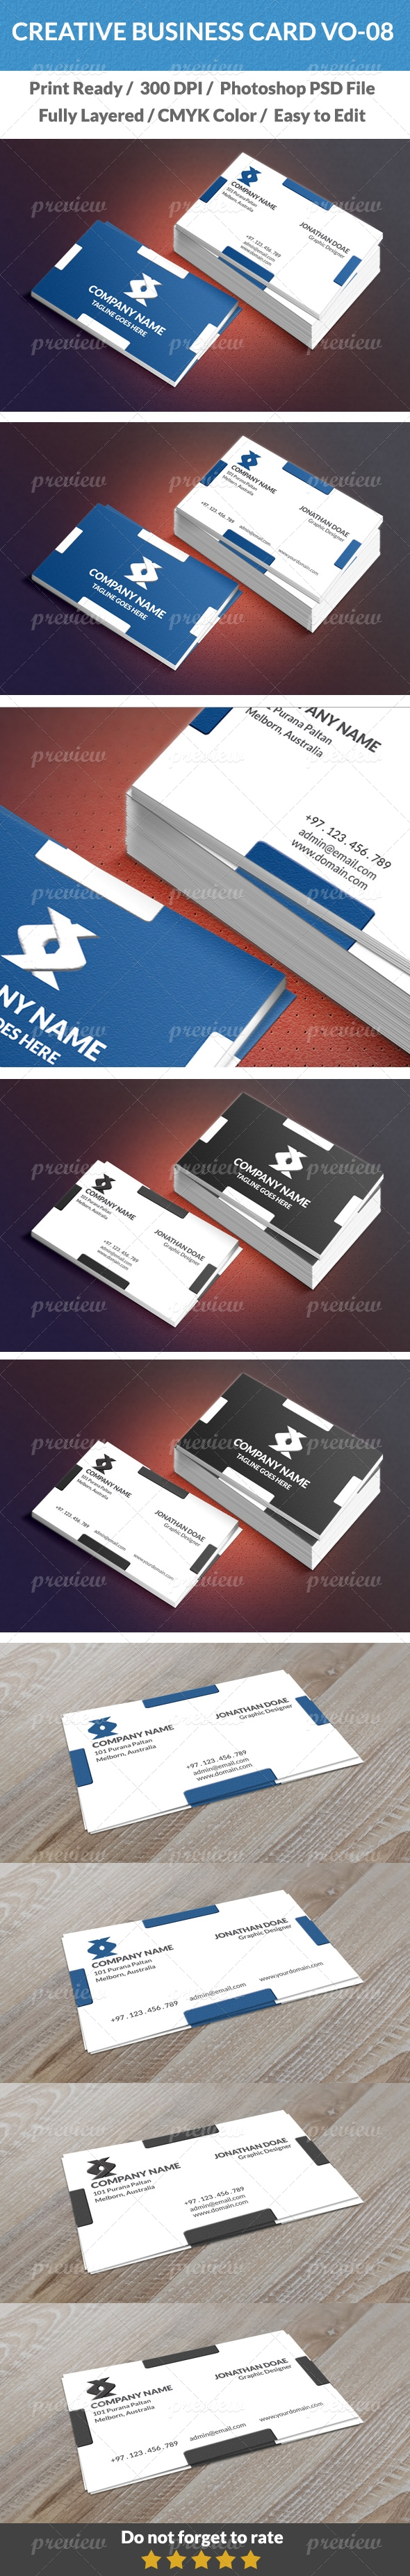 Creative Business Card Vo - 08